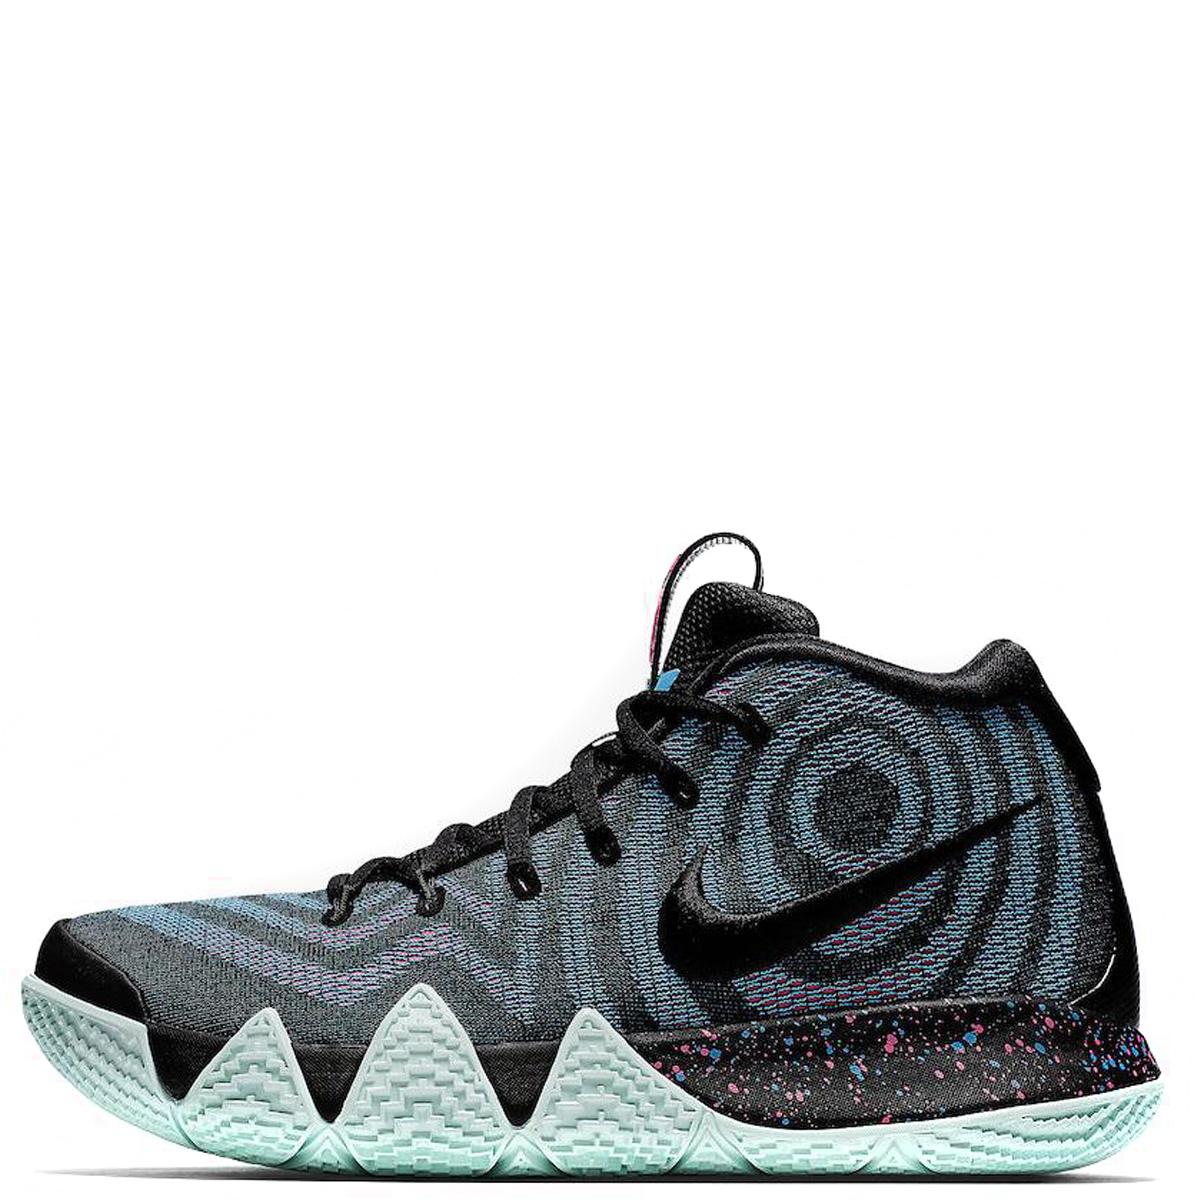 cc9c04fb1936 ALLSPORTS  Nike NIKE chi Lee 4 sneakers men KYRIE 4 EP black 943